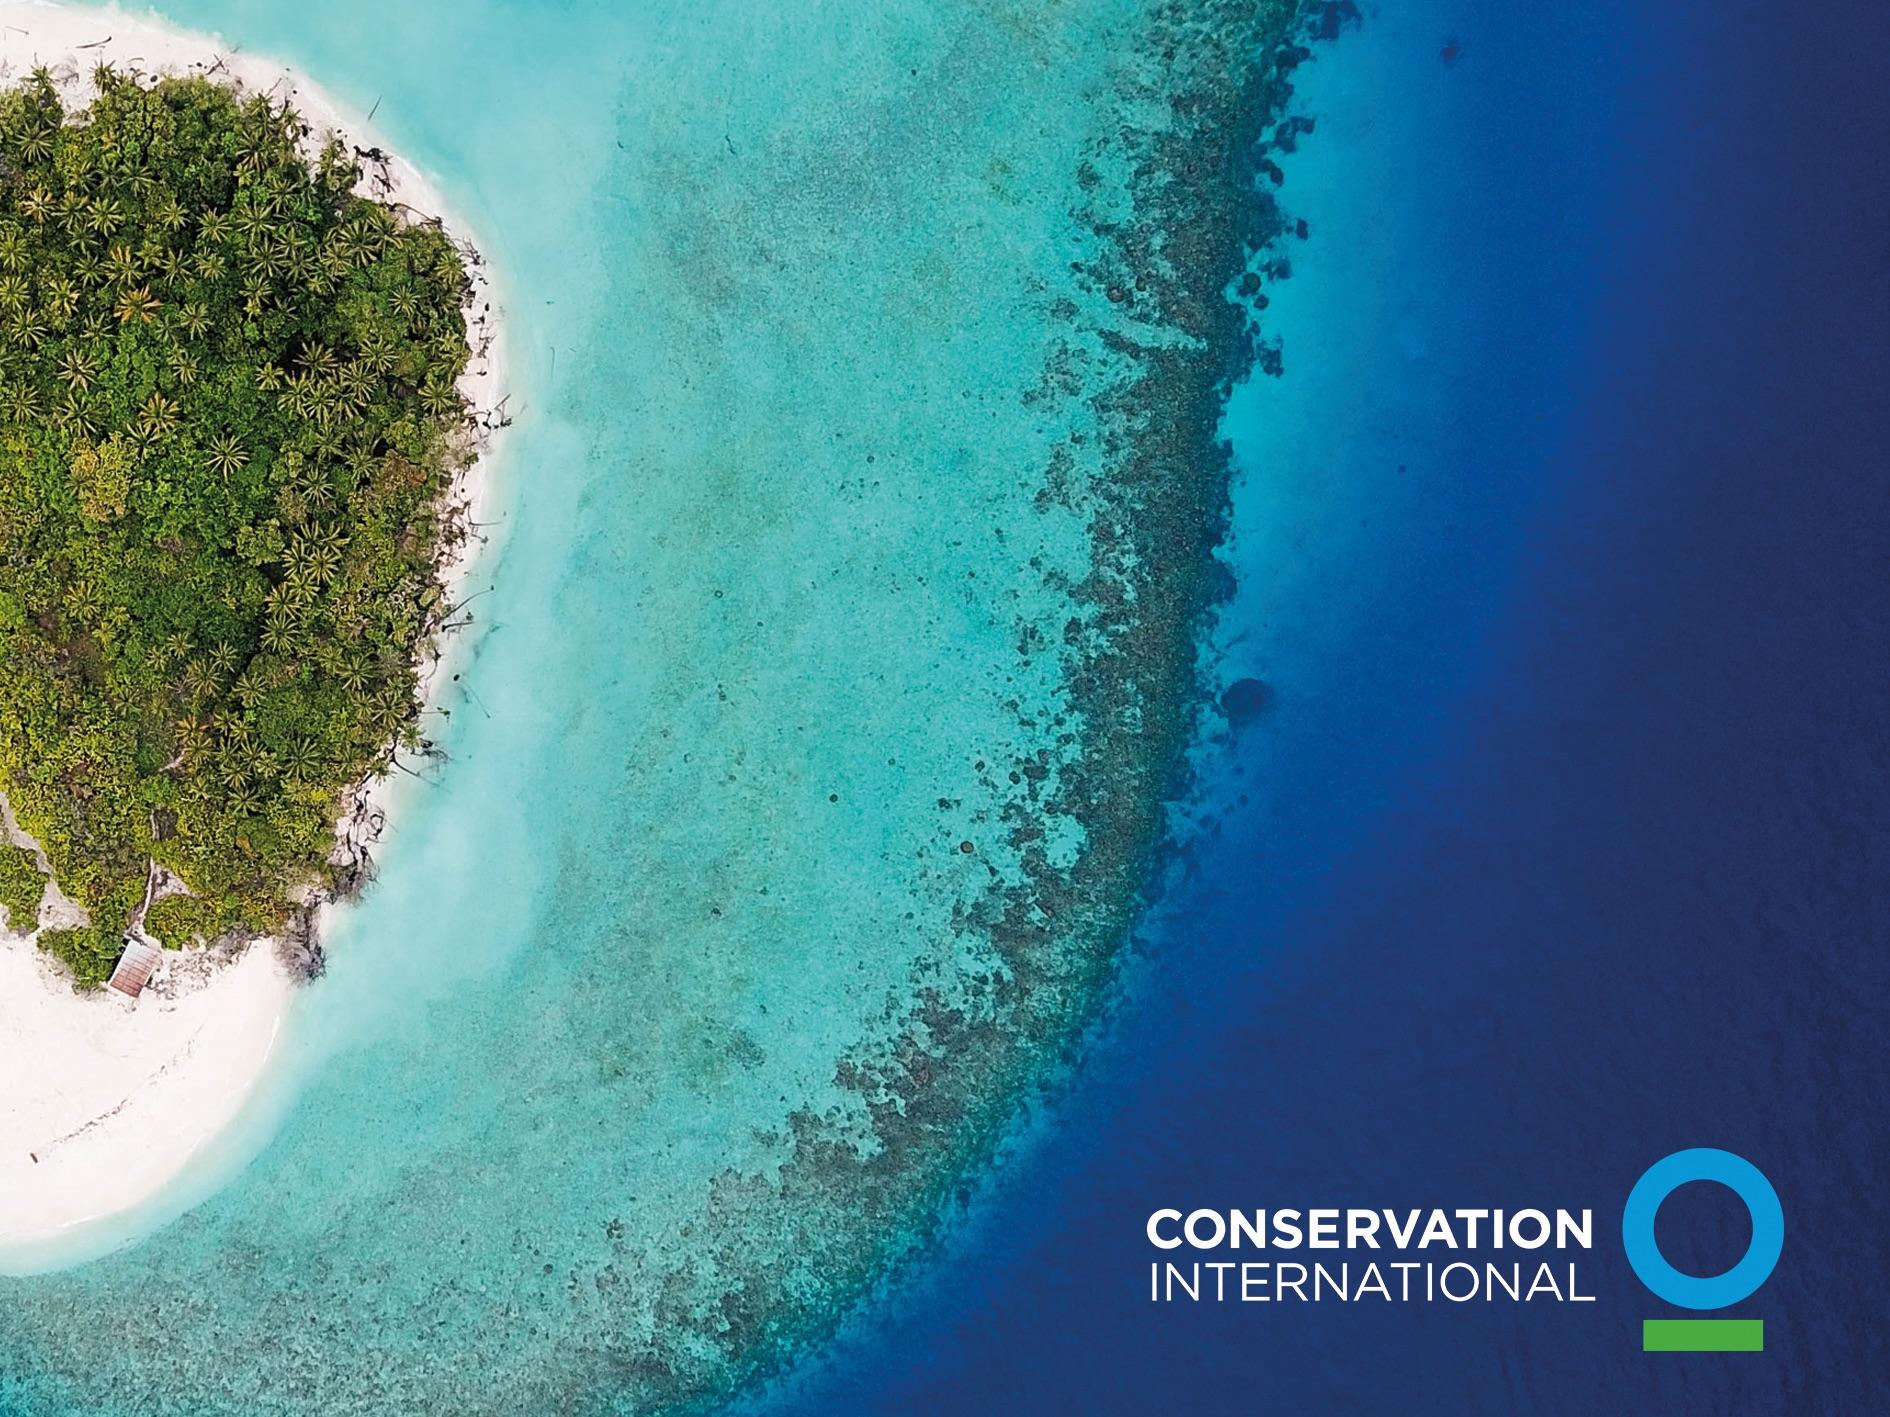 https://api.treecer.com/storage/754/Conservation-International-Bild.jpg